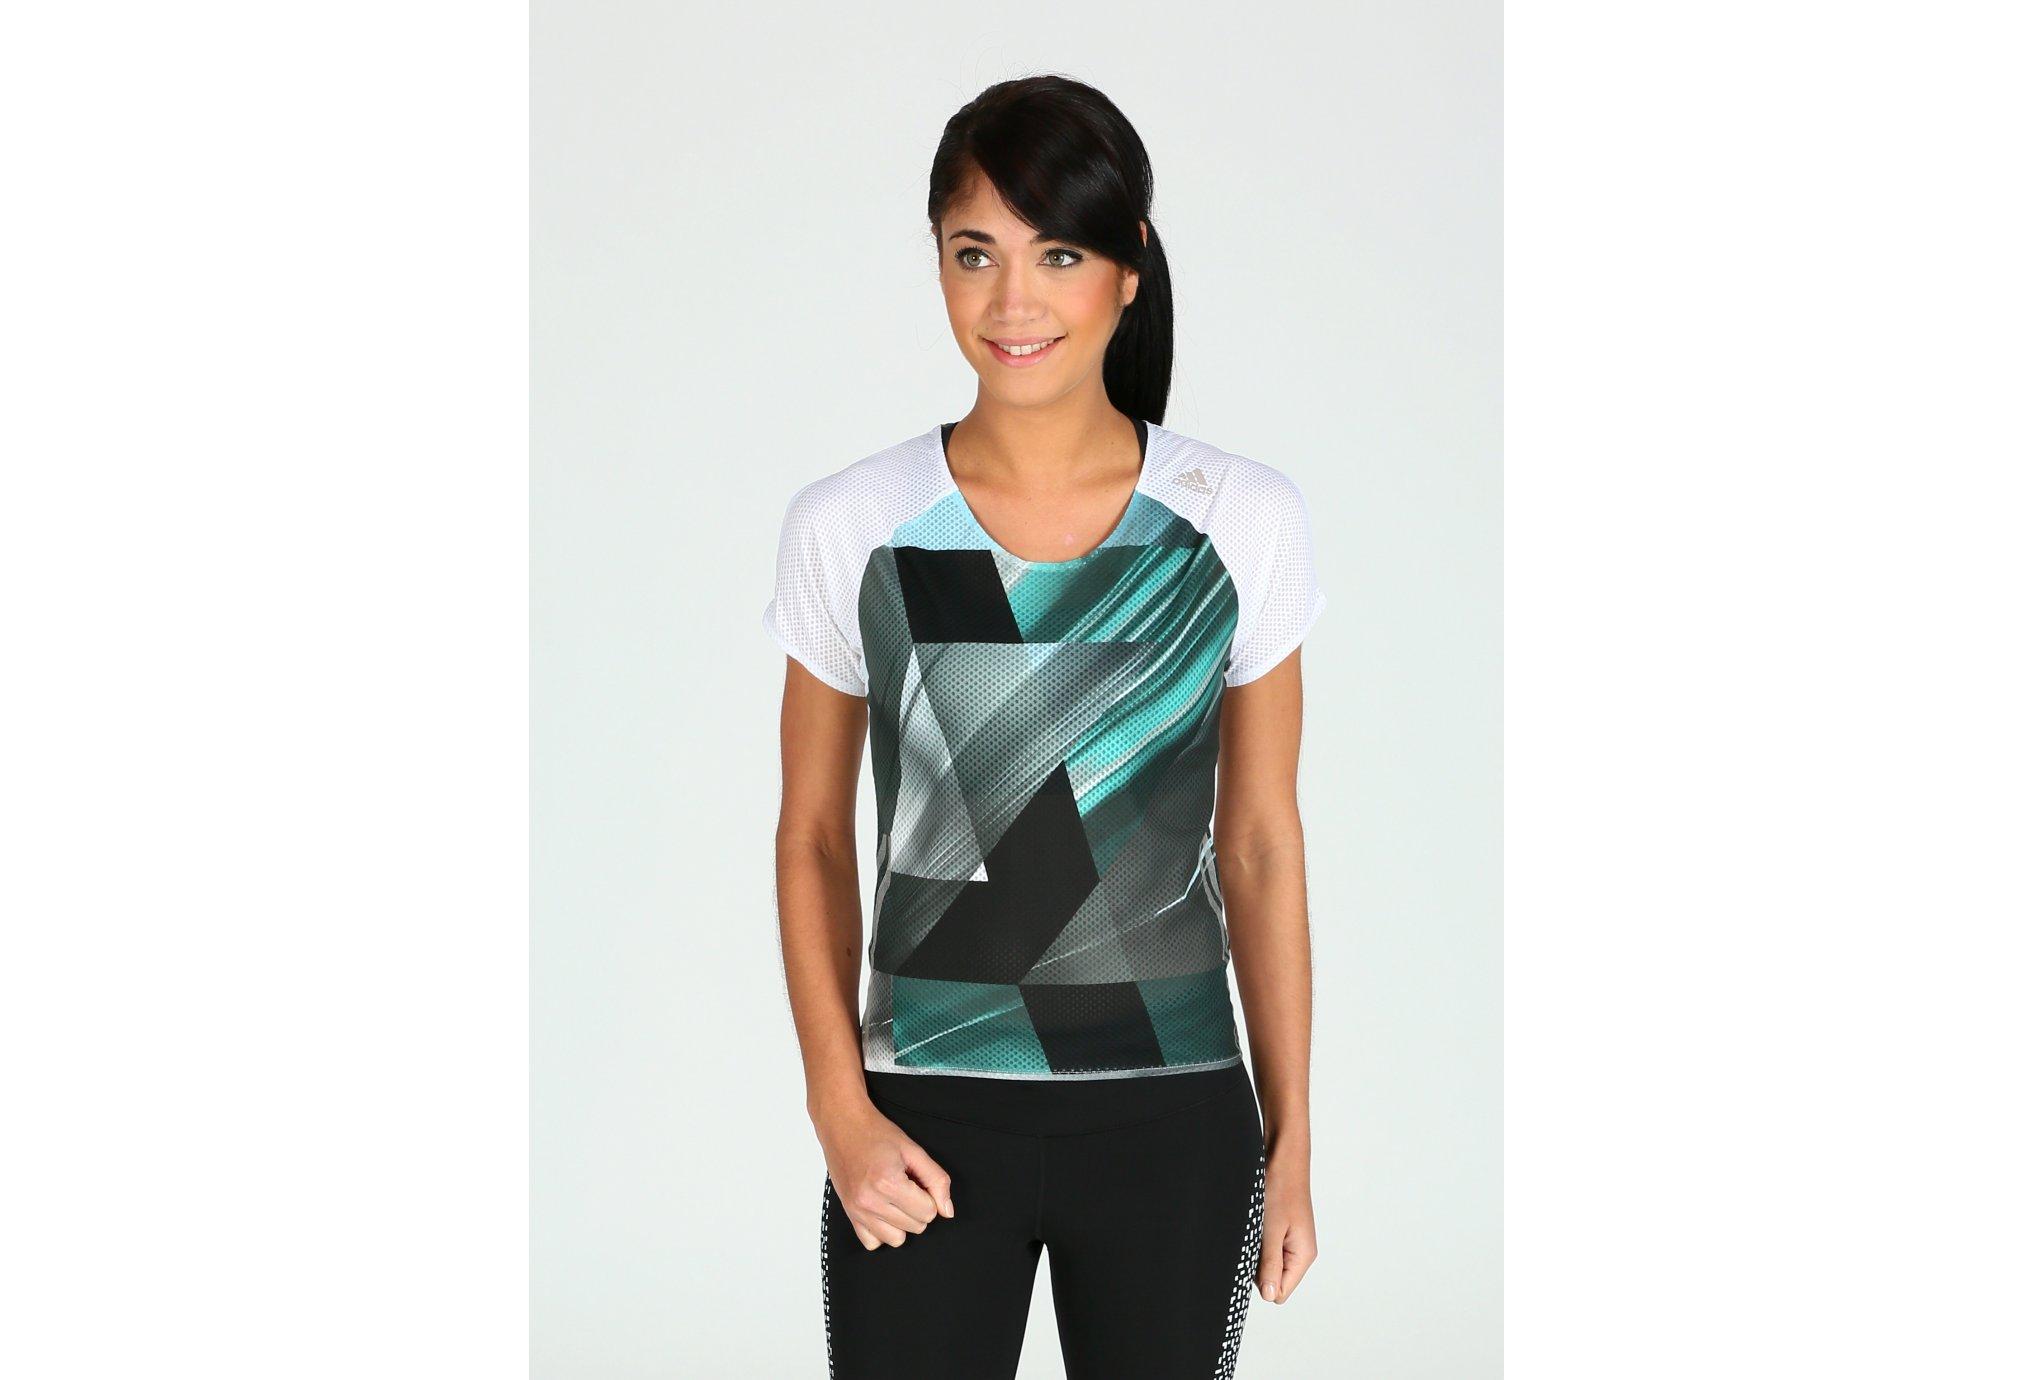 adidas Tee-shirt adizero W Diététique Vêtements femme